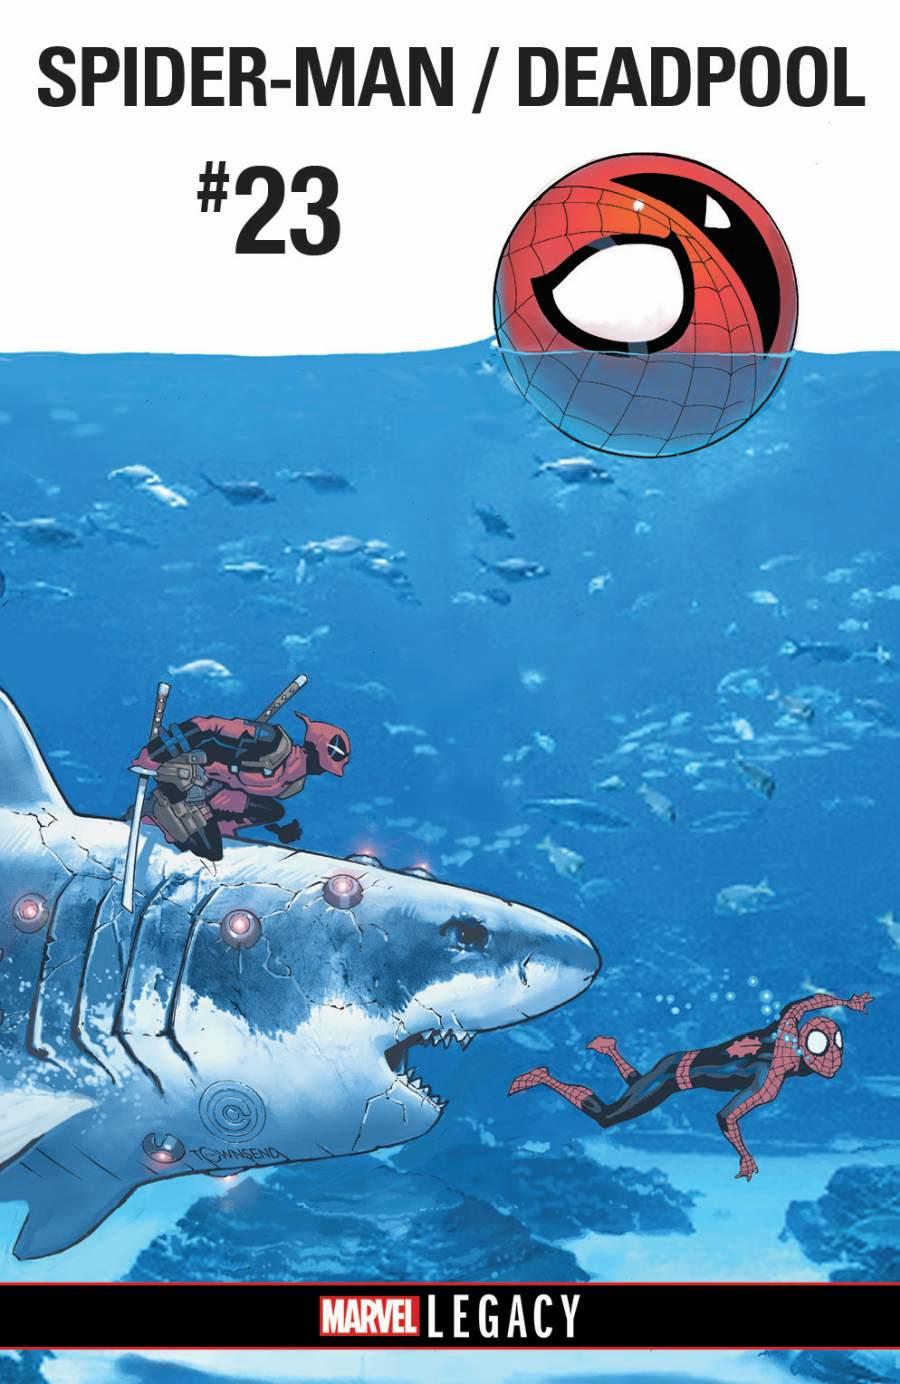 Spider-Man Deadpool 23 Marvel Legacy